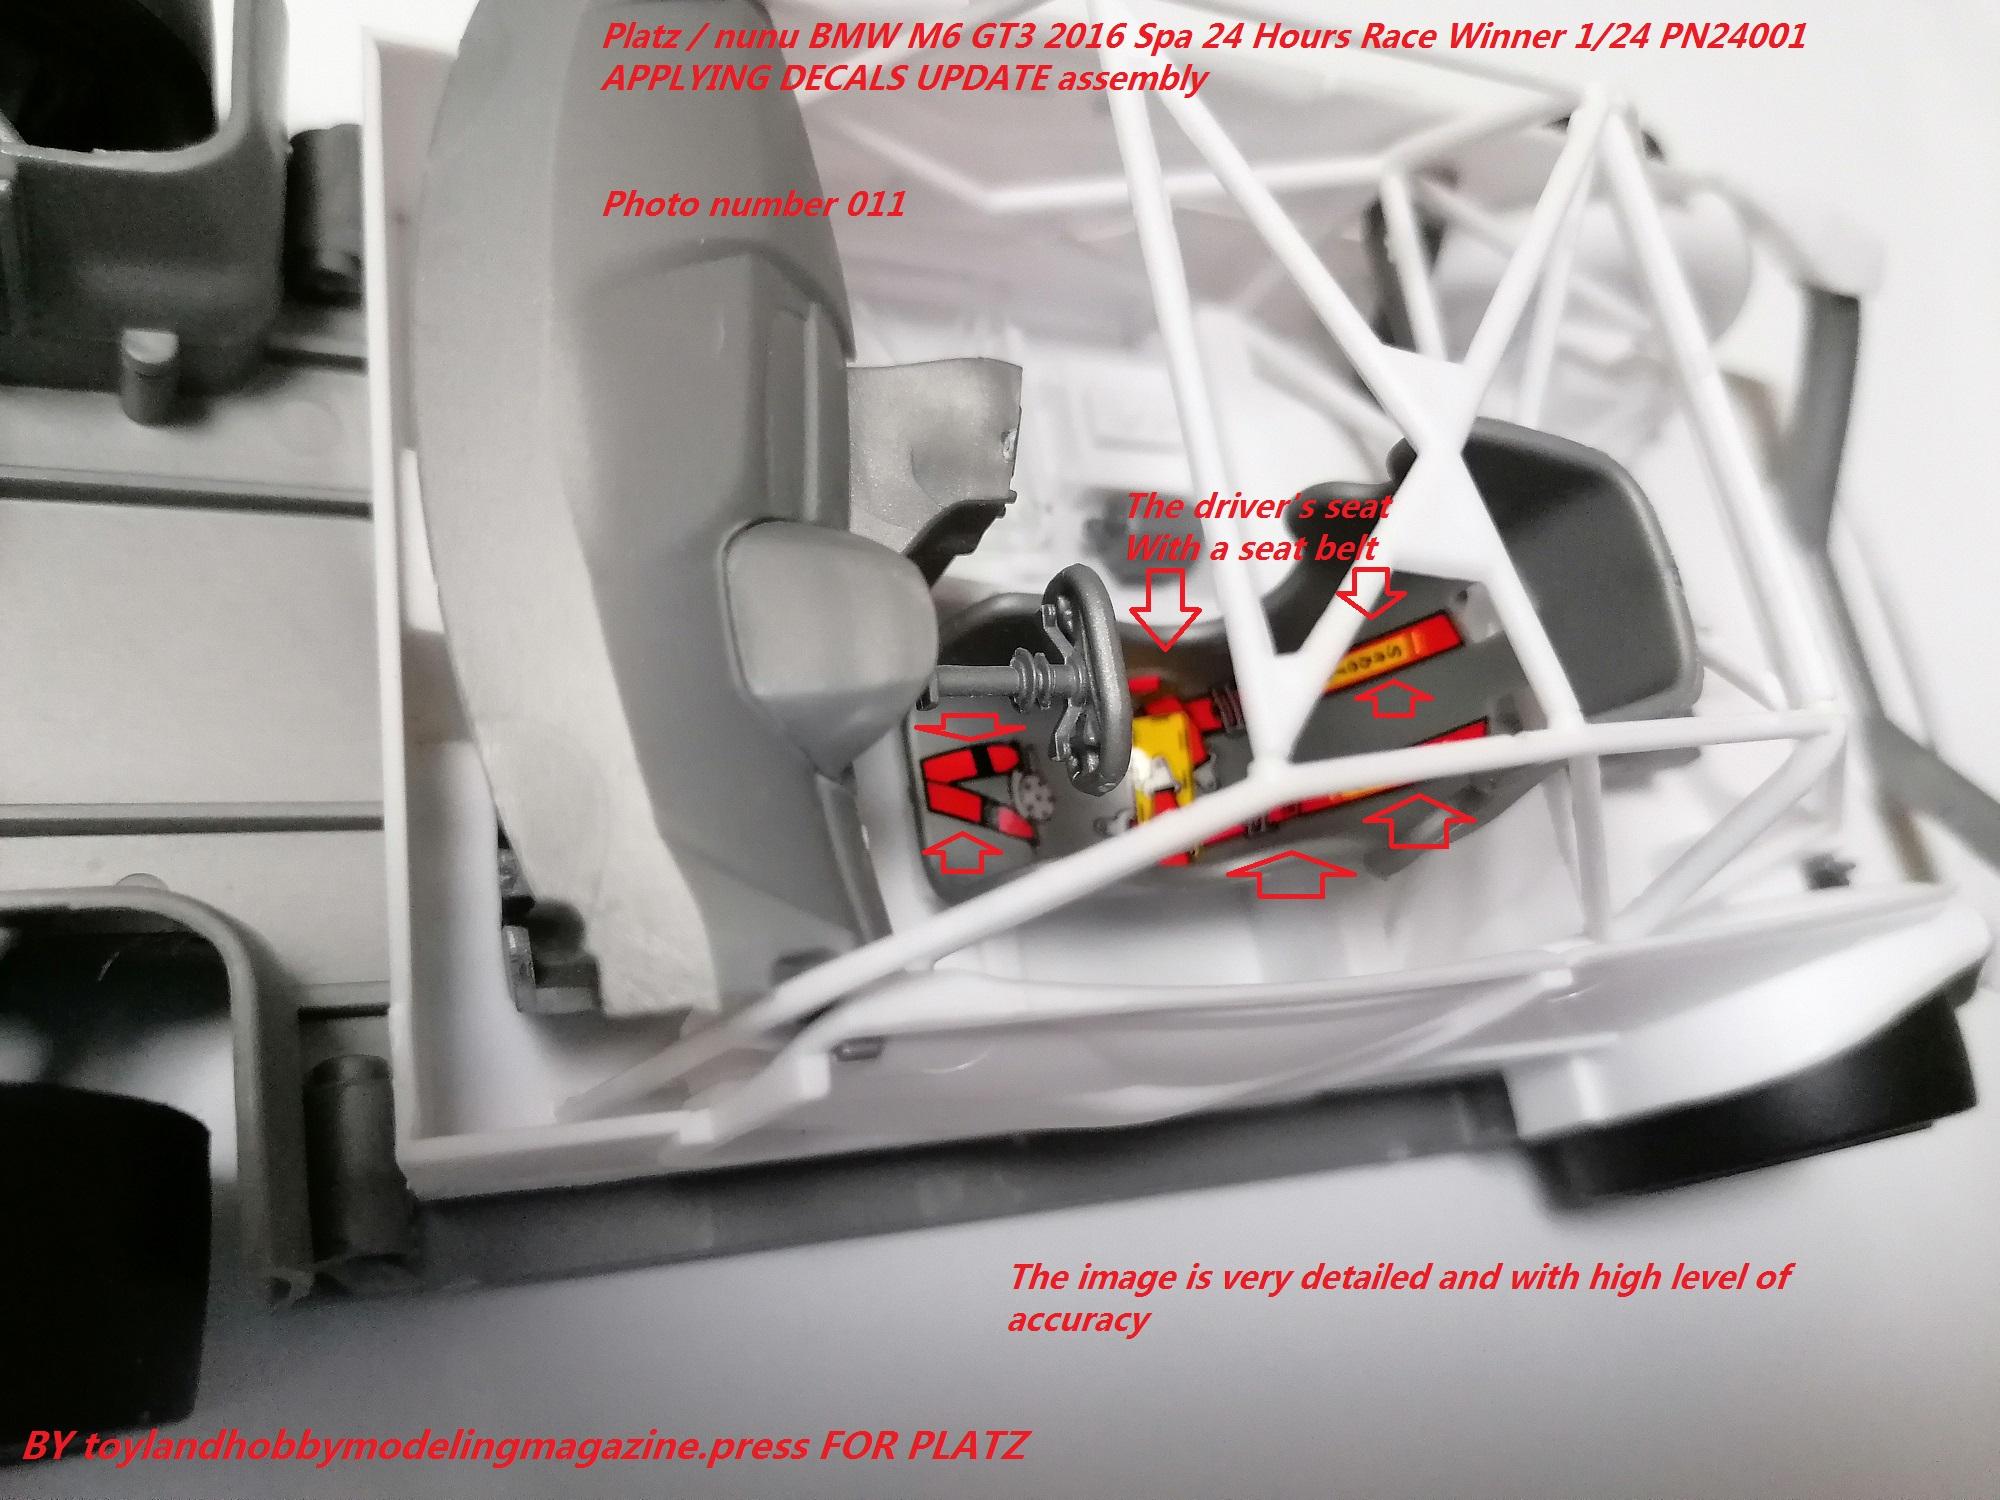 2005 2006 20007 2008 2009 2010 2011 2012 Porsche 911 997 Lower Control Arm